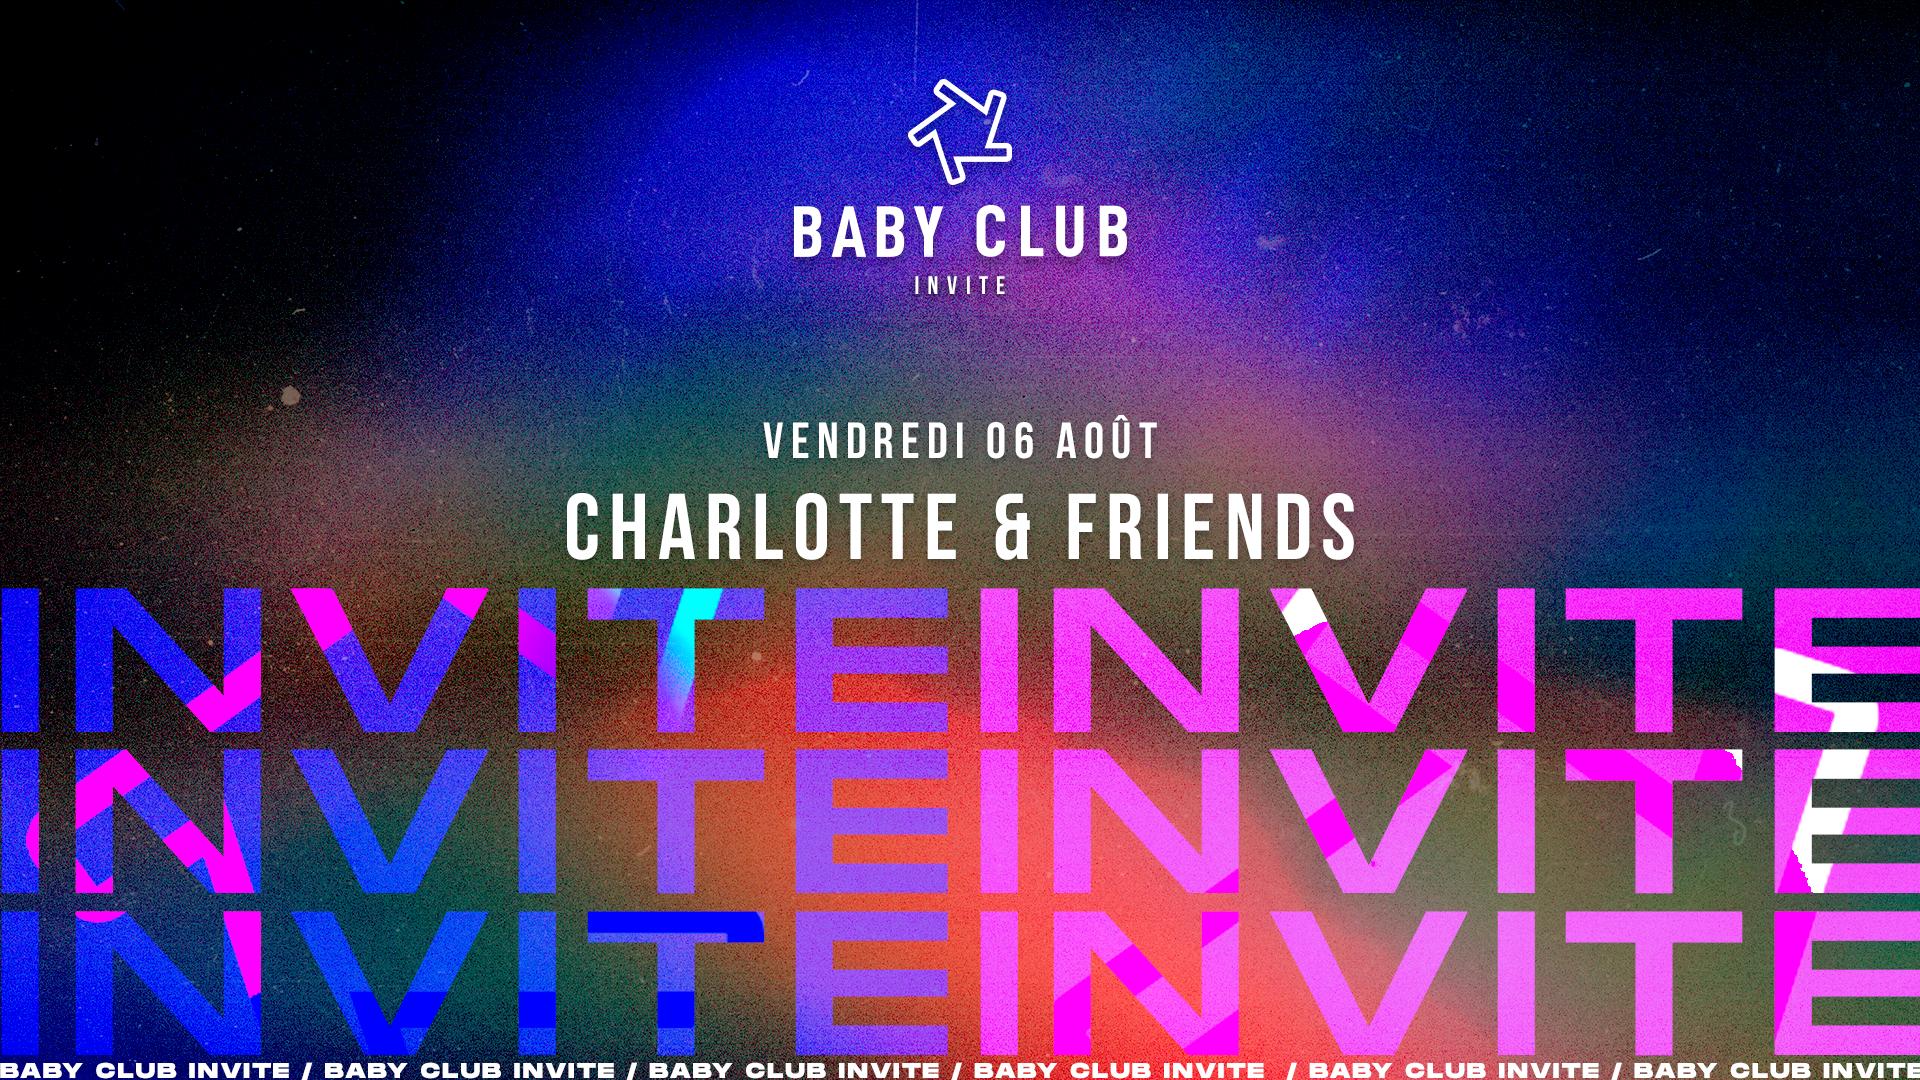 Baby invite Charlotte & Friends